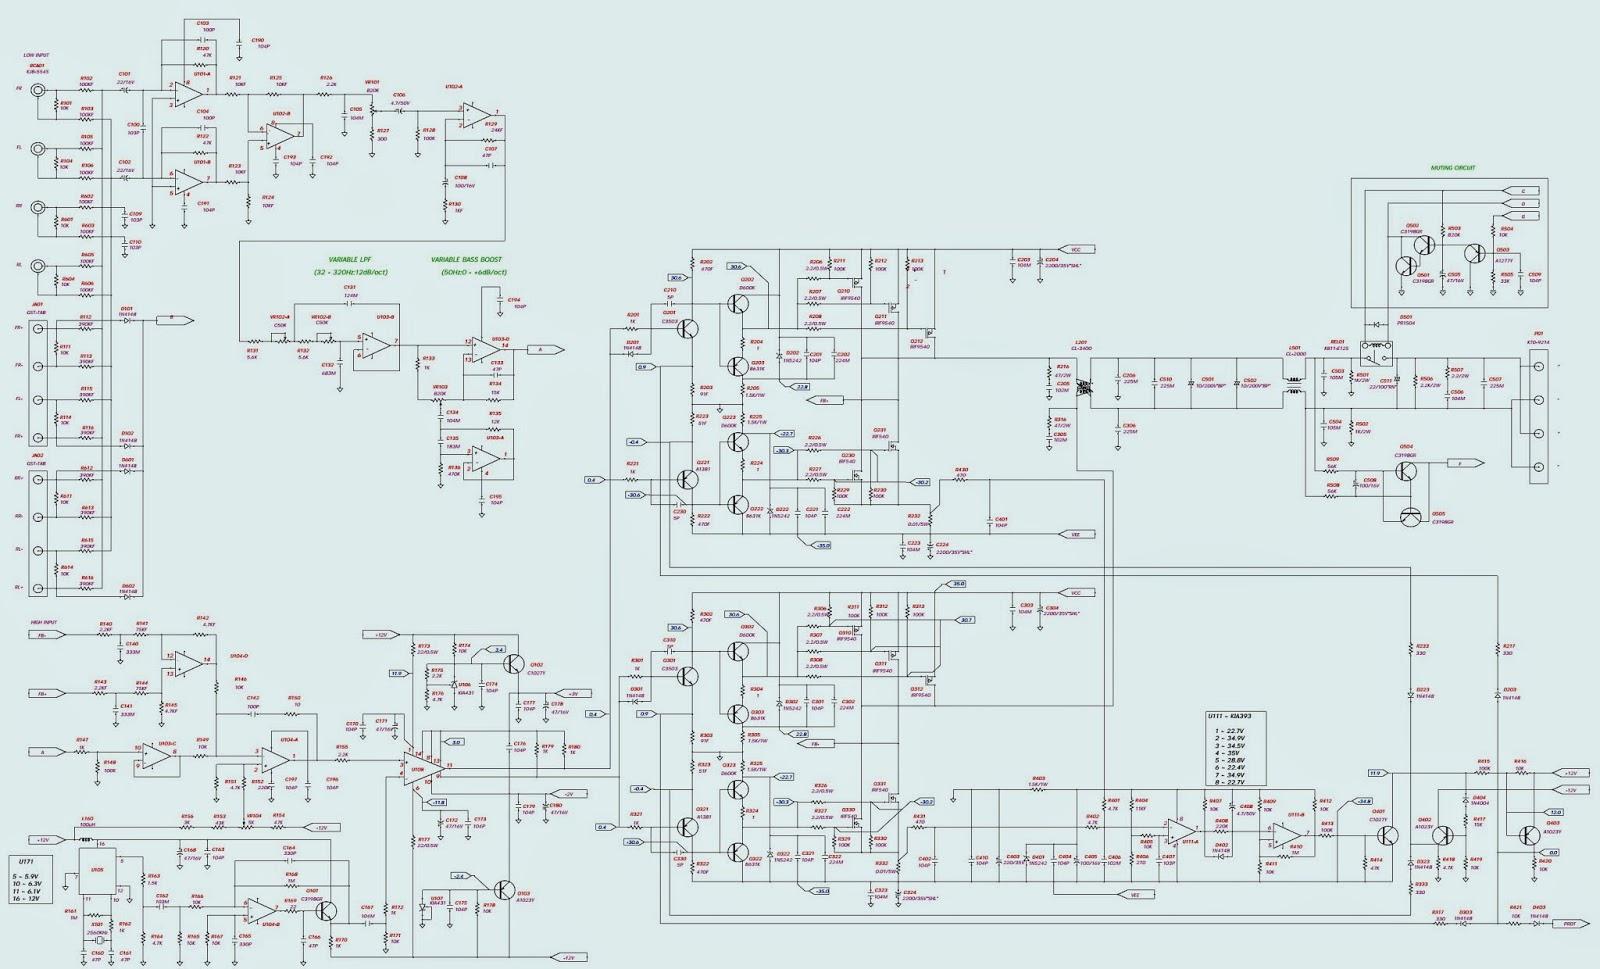 jbl wiring diagram wiring diagram schematics jbl 26ct wiring diagram [ 1600 x 969 Pixel ]